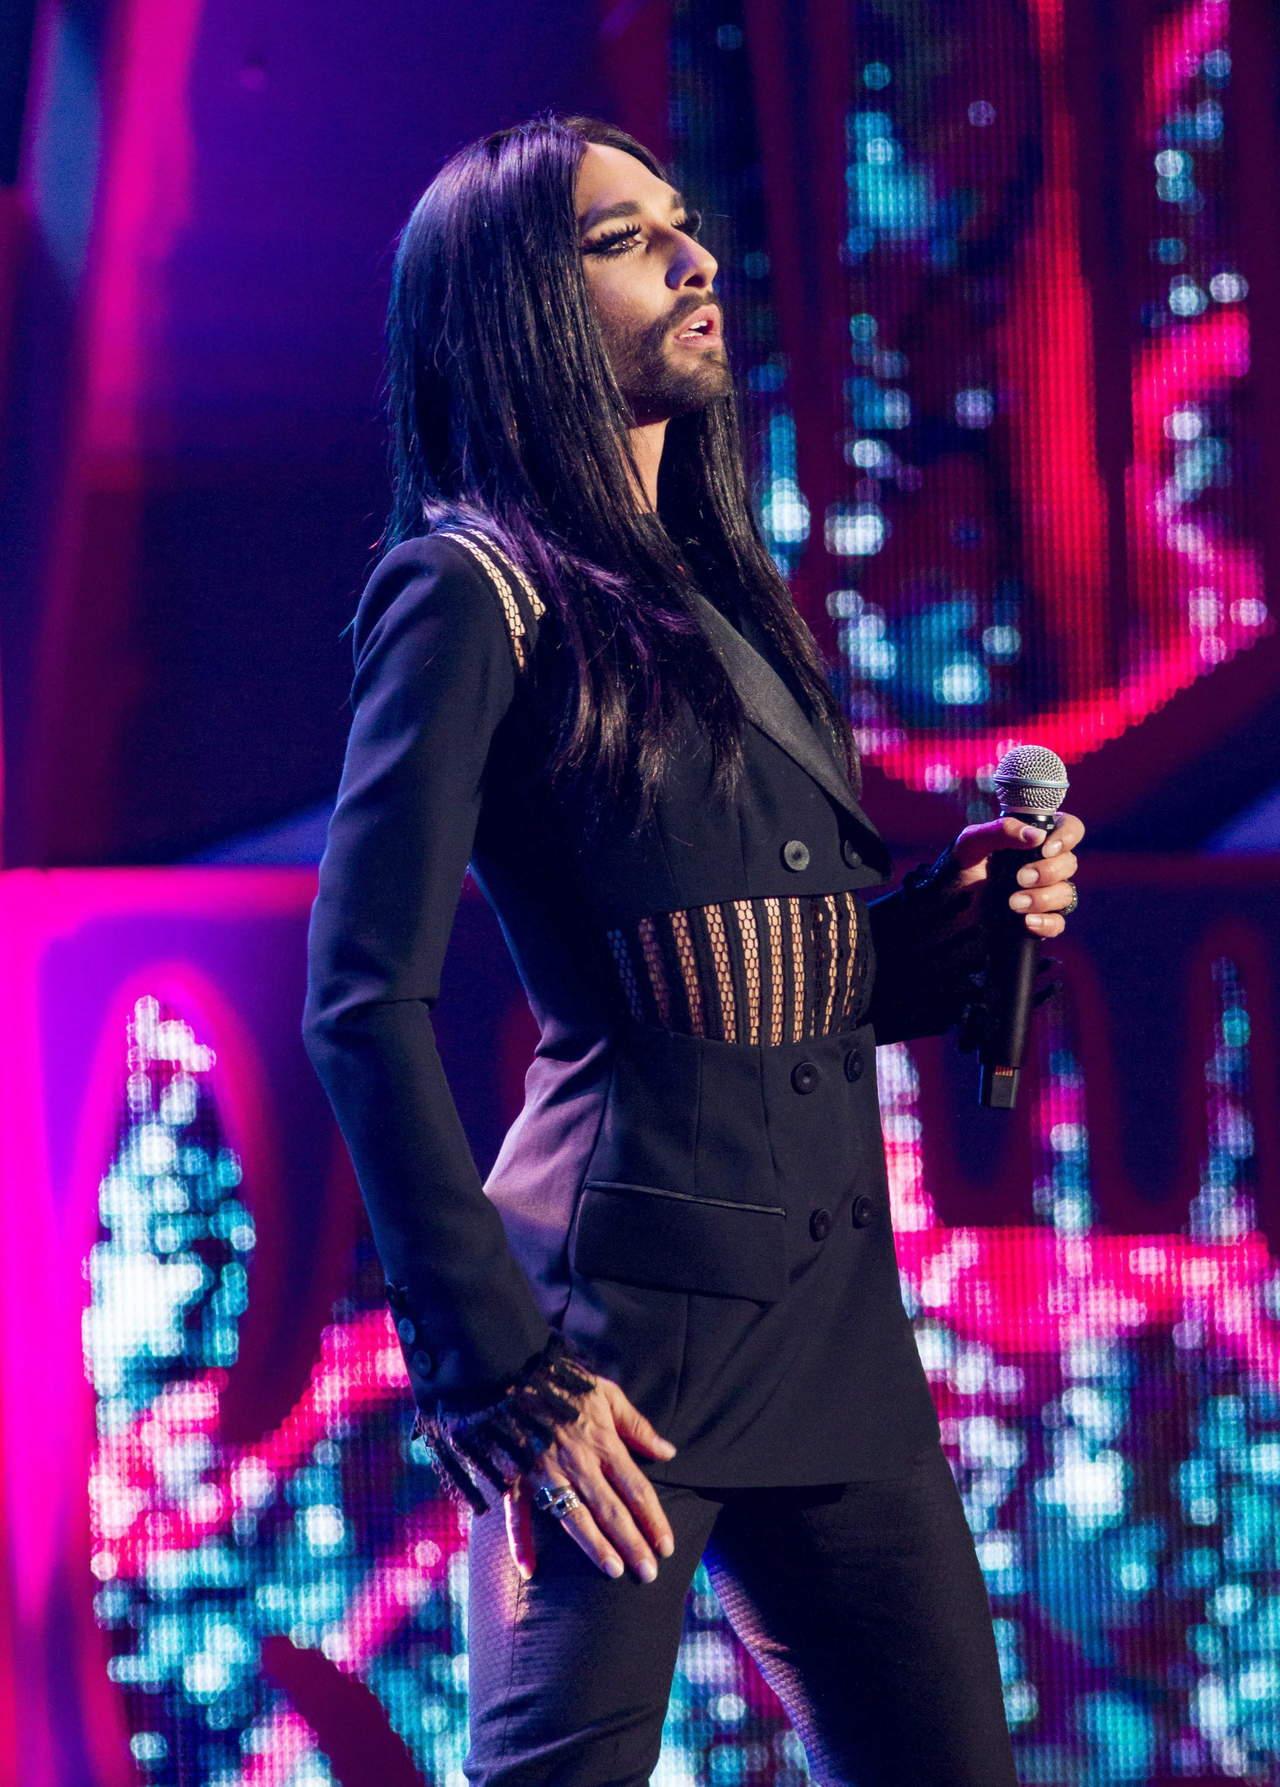 Conchita Wurst confiesa que es portadora de VIH